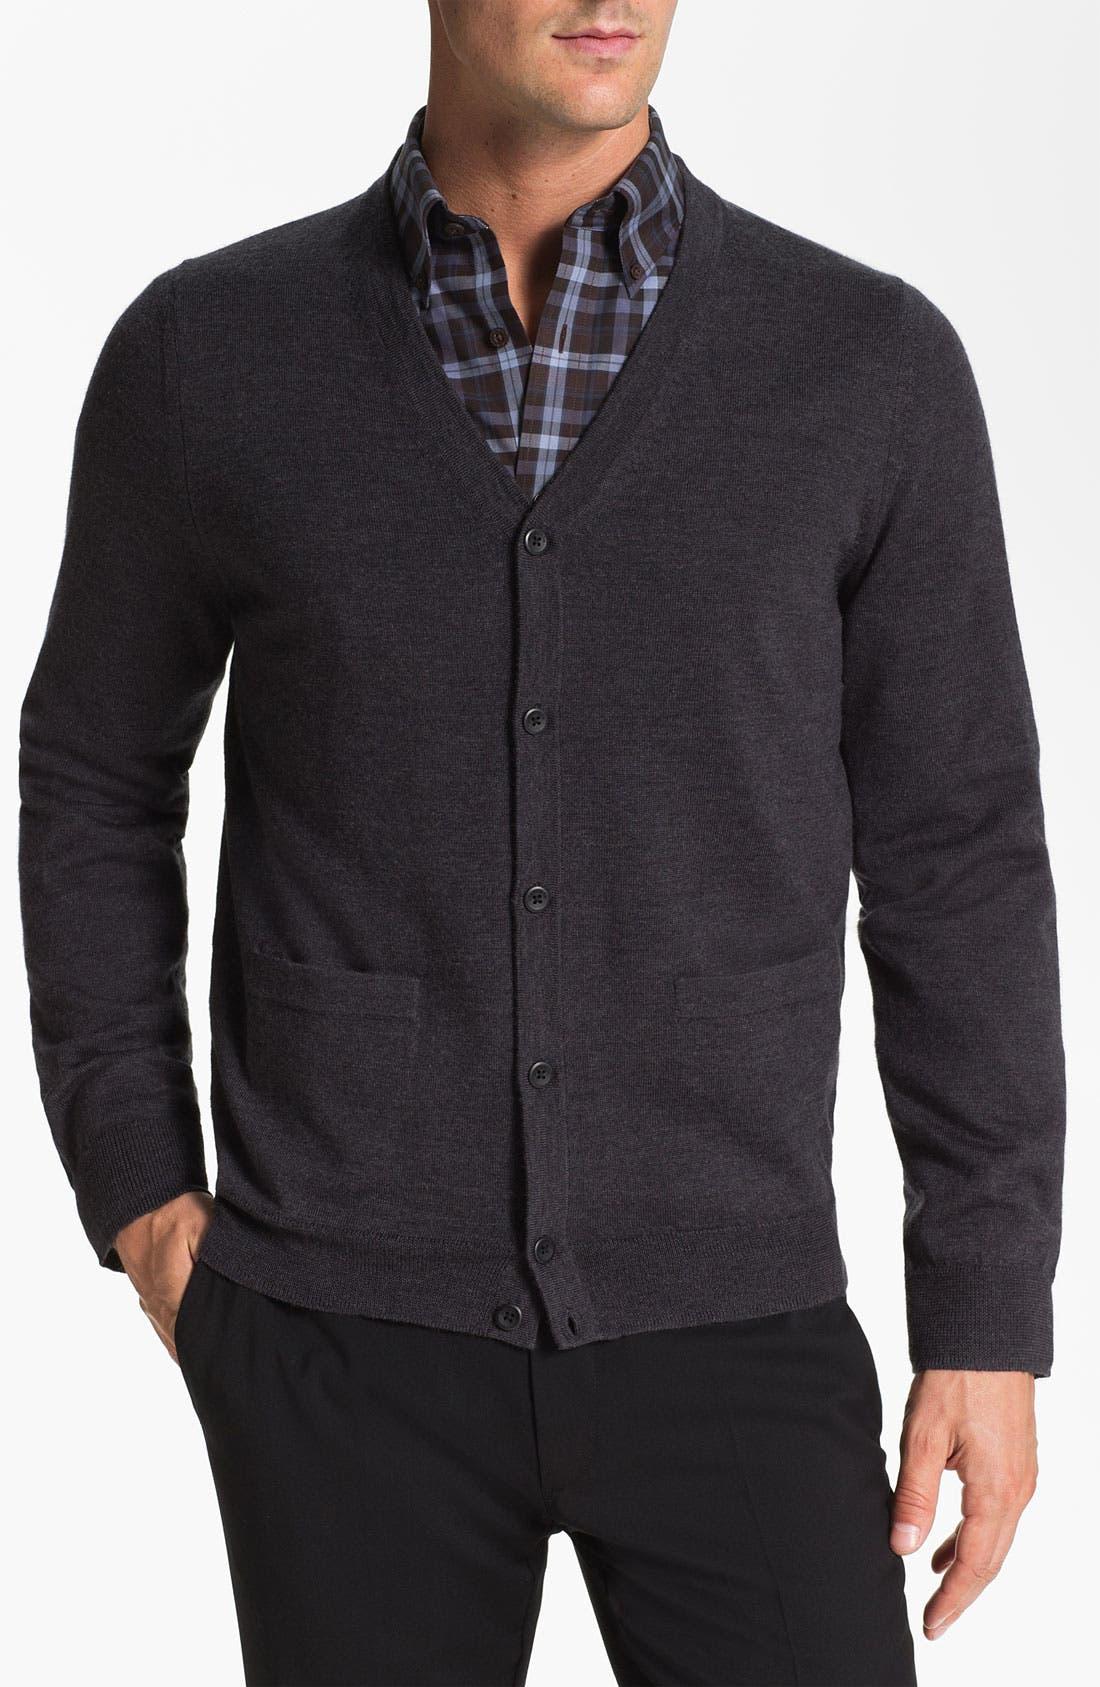 Alternate Image 1 Selected - Nordstrom Merino Wool Button Cardigan